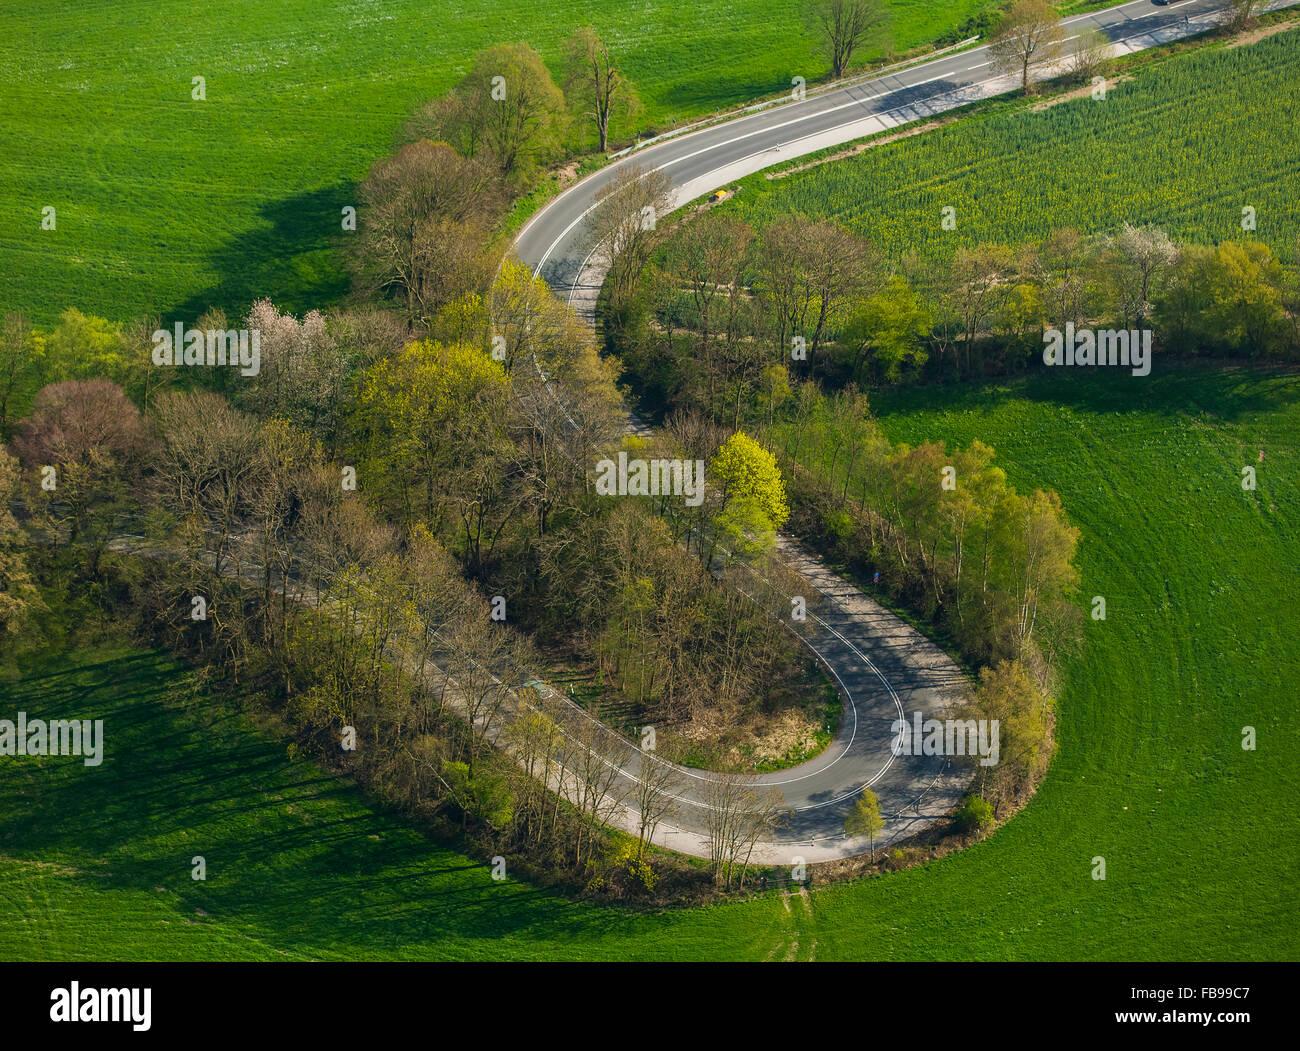 Aerial, S-curves Kuhlendahler road, hairpin bends, Velbert, Ruhr, Velbert-Neviges, North Rhine Westphalia, Germany, - Stock Image